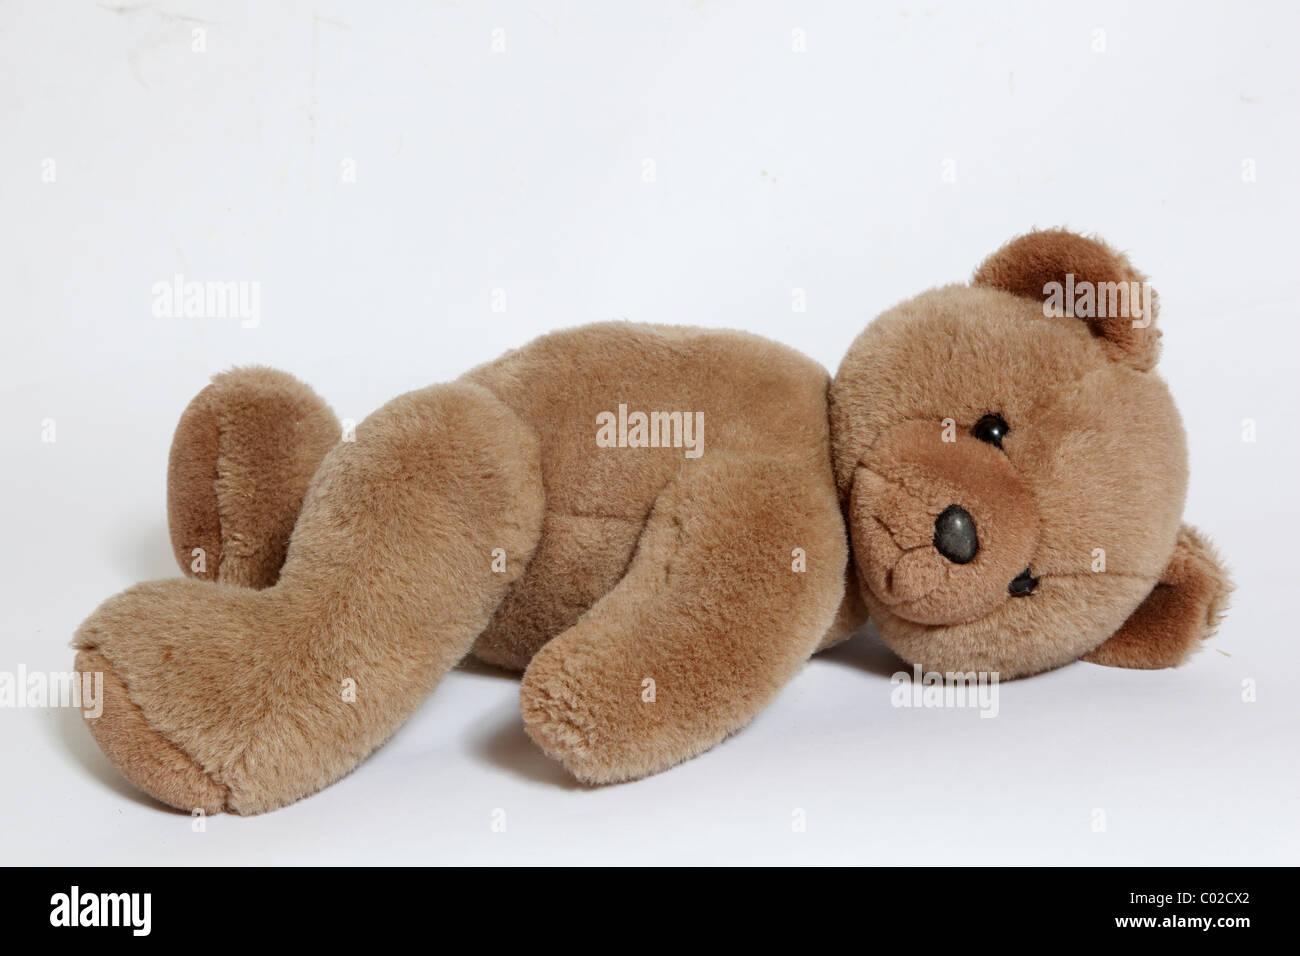 Sad Foto StockImmagini Teddy Baer Alamy F13c5uTlKJ